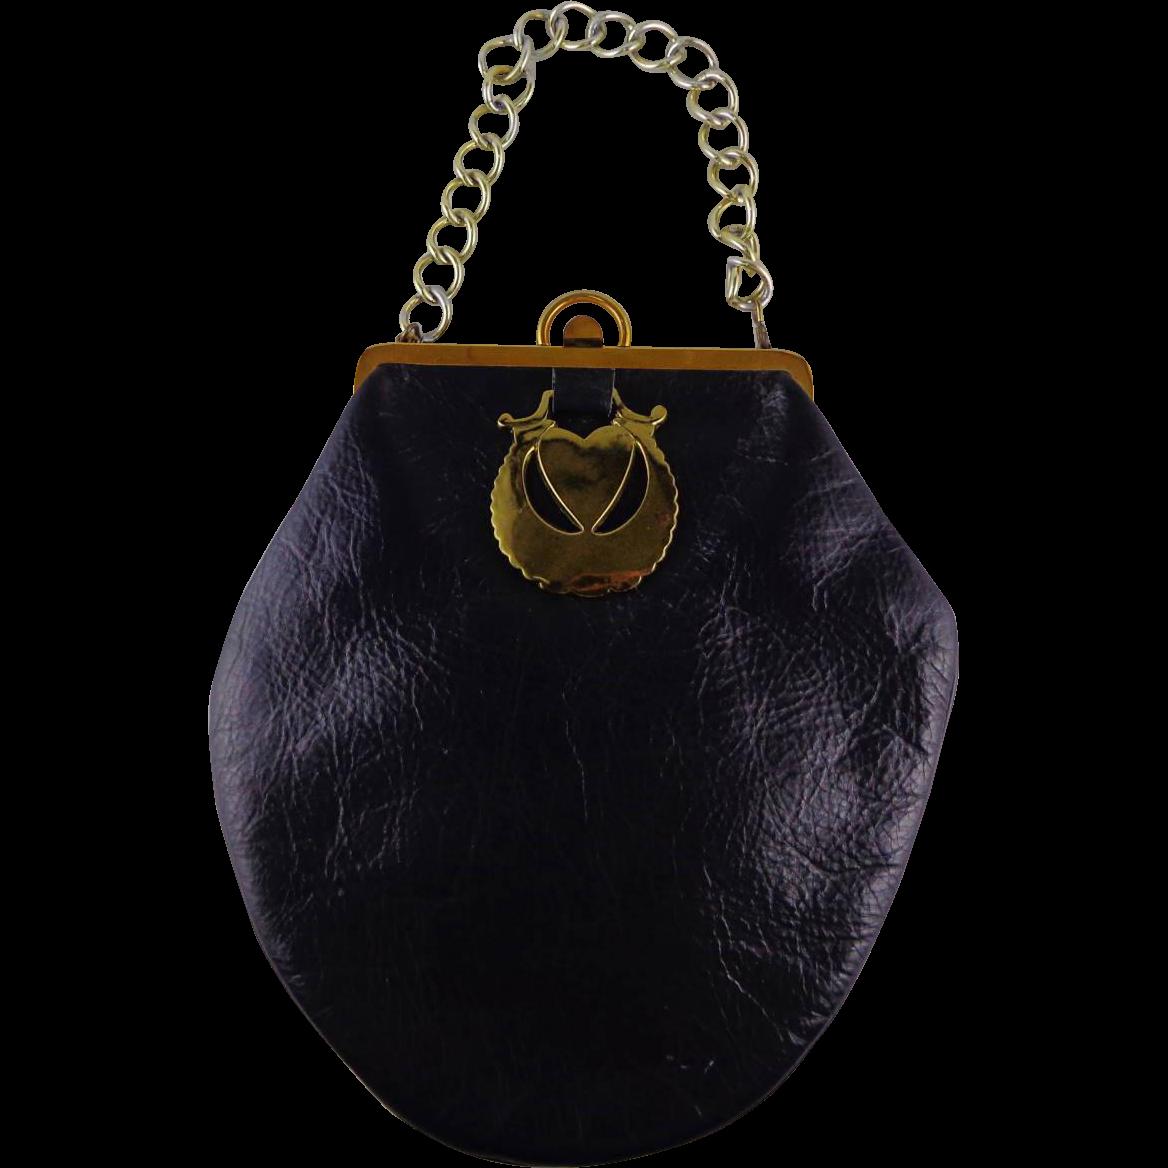 Vintage Black Leather  Purse by Roger Van